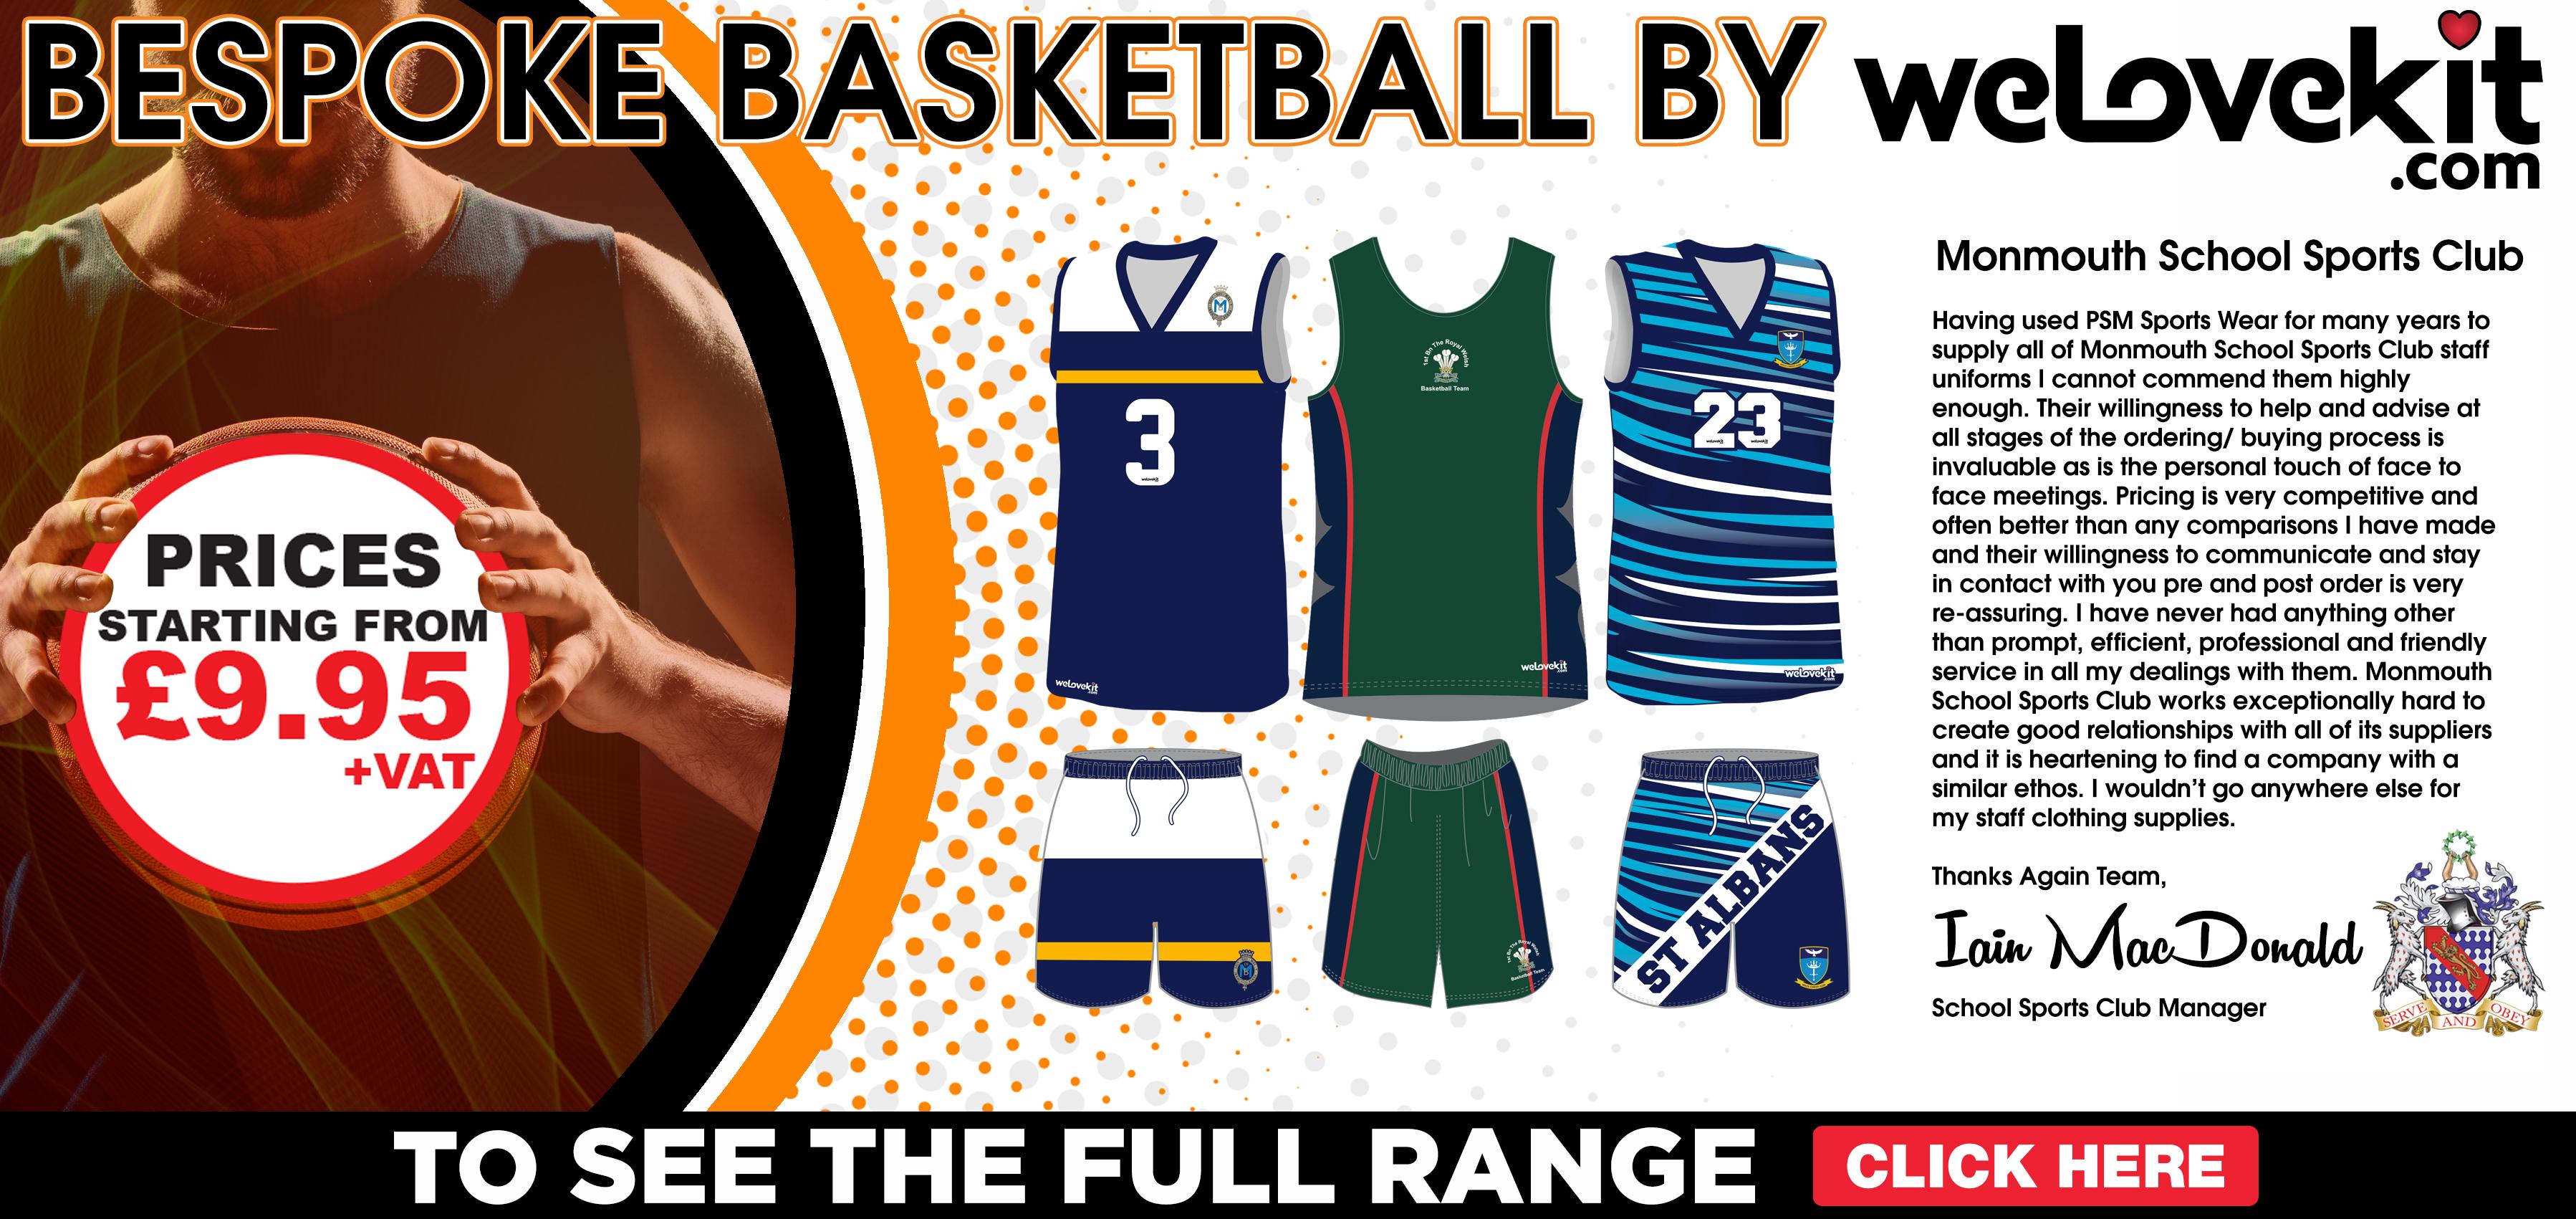 wlk_basketball_2021